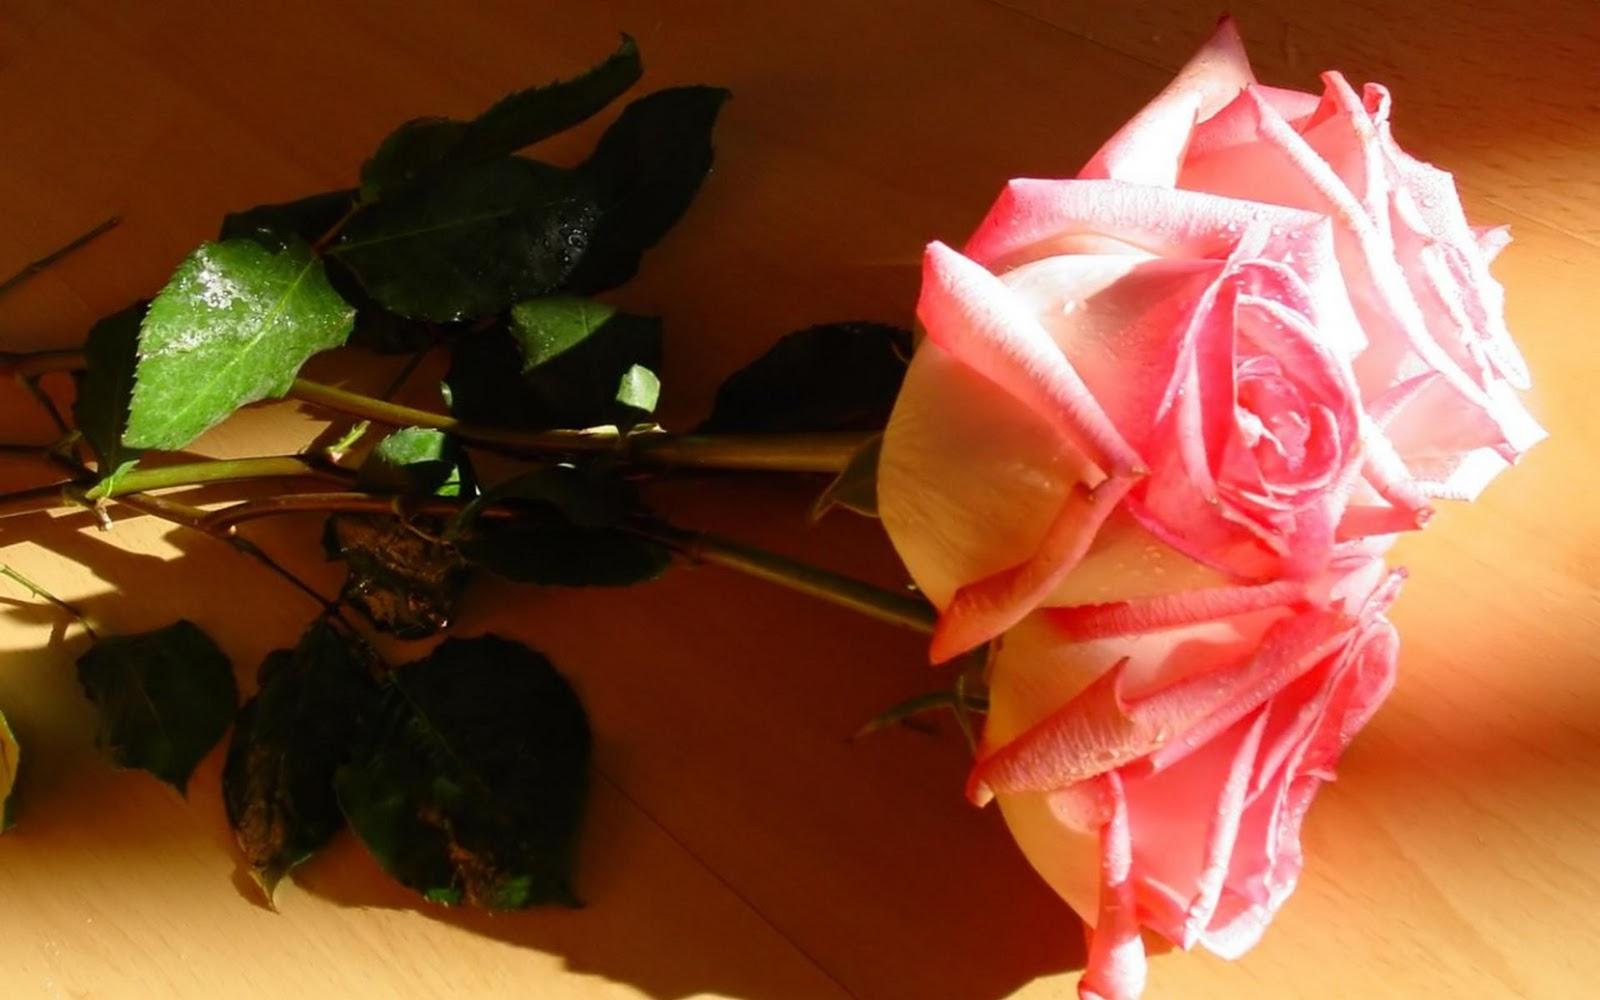 http://4.bp.blogspot.com/-pwezTrlff5c/TWEZG6nl1tI/AAAAAAAAAIc/KQfYhWmACGw/s1600/Rose_perfect_love_symbol_hd_wallpaper.jpg